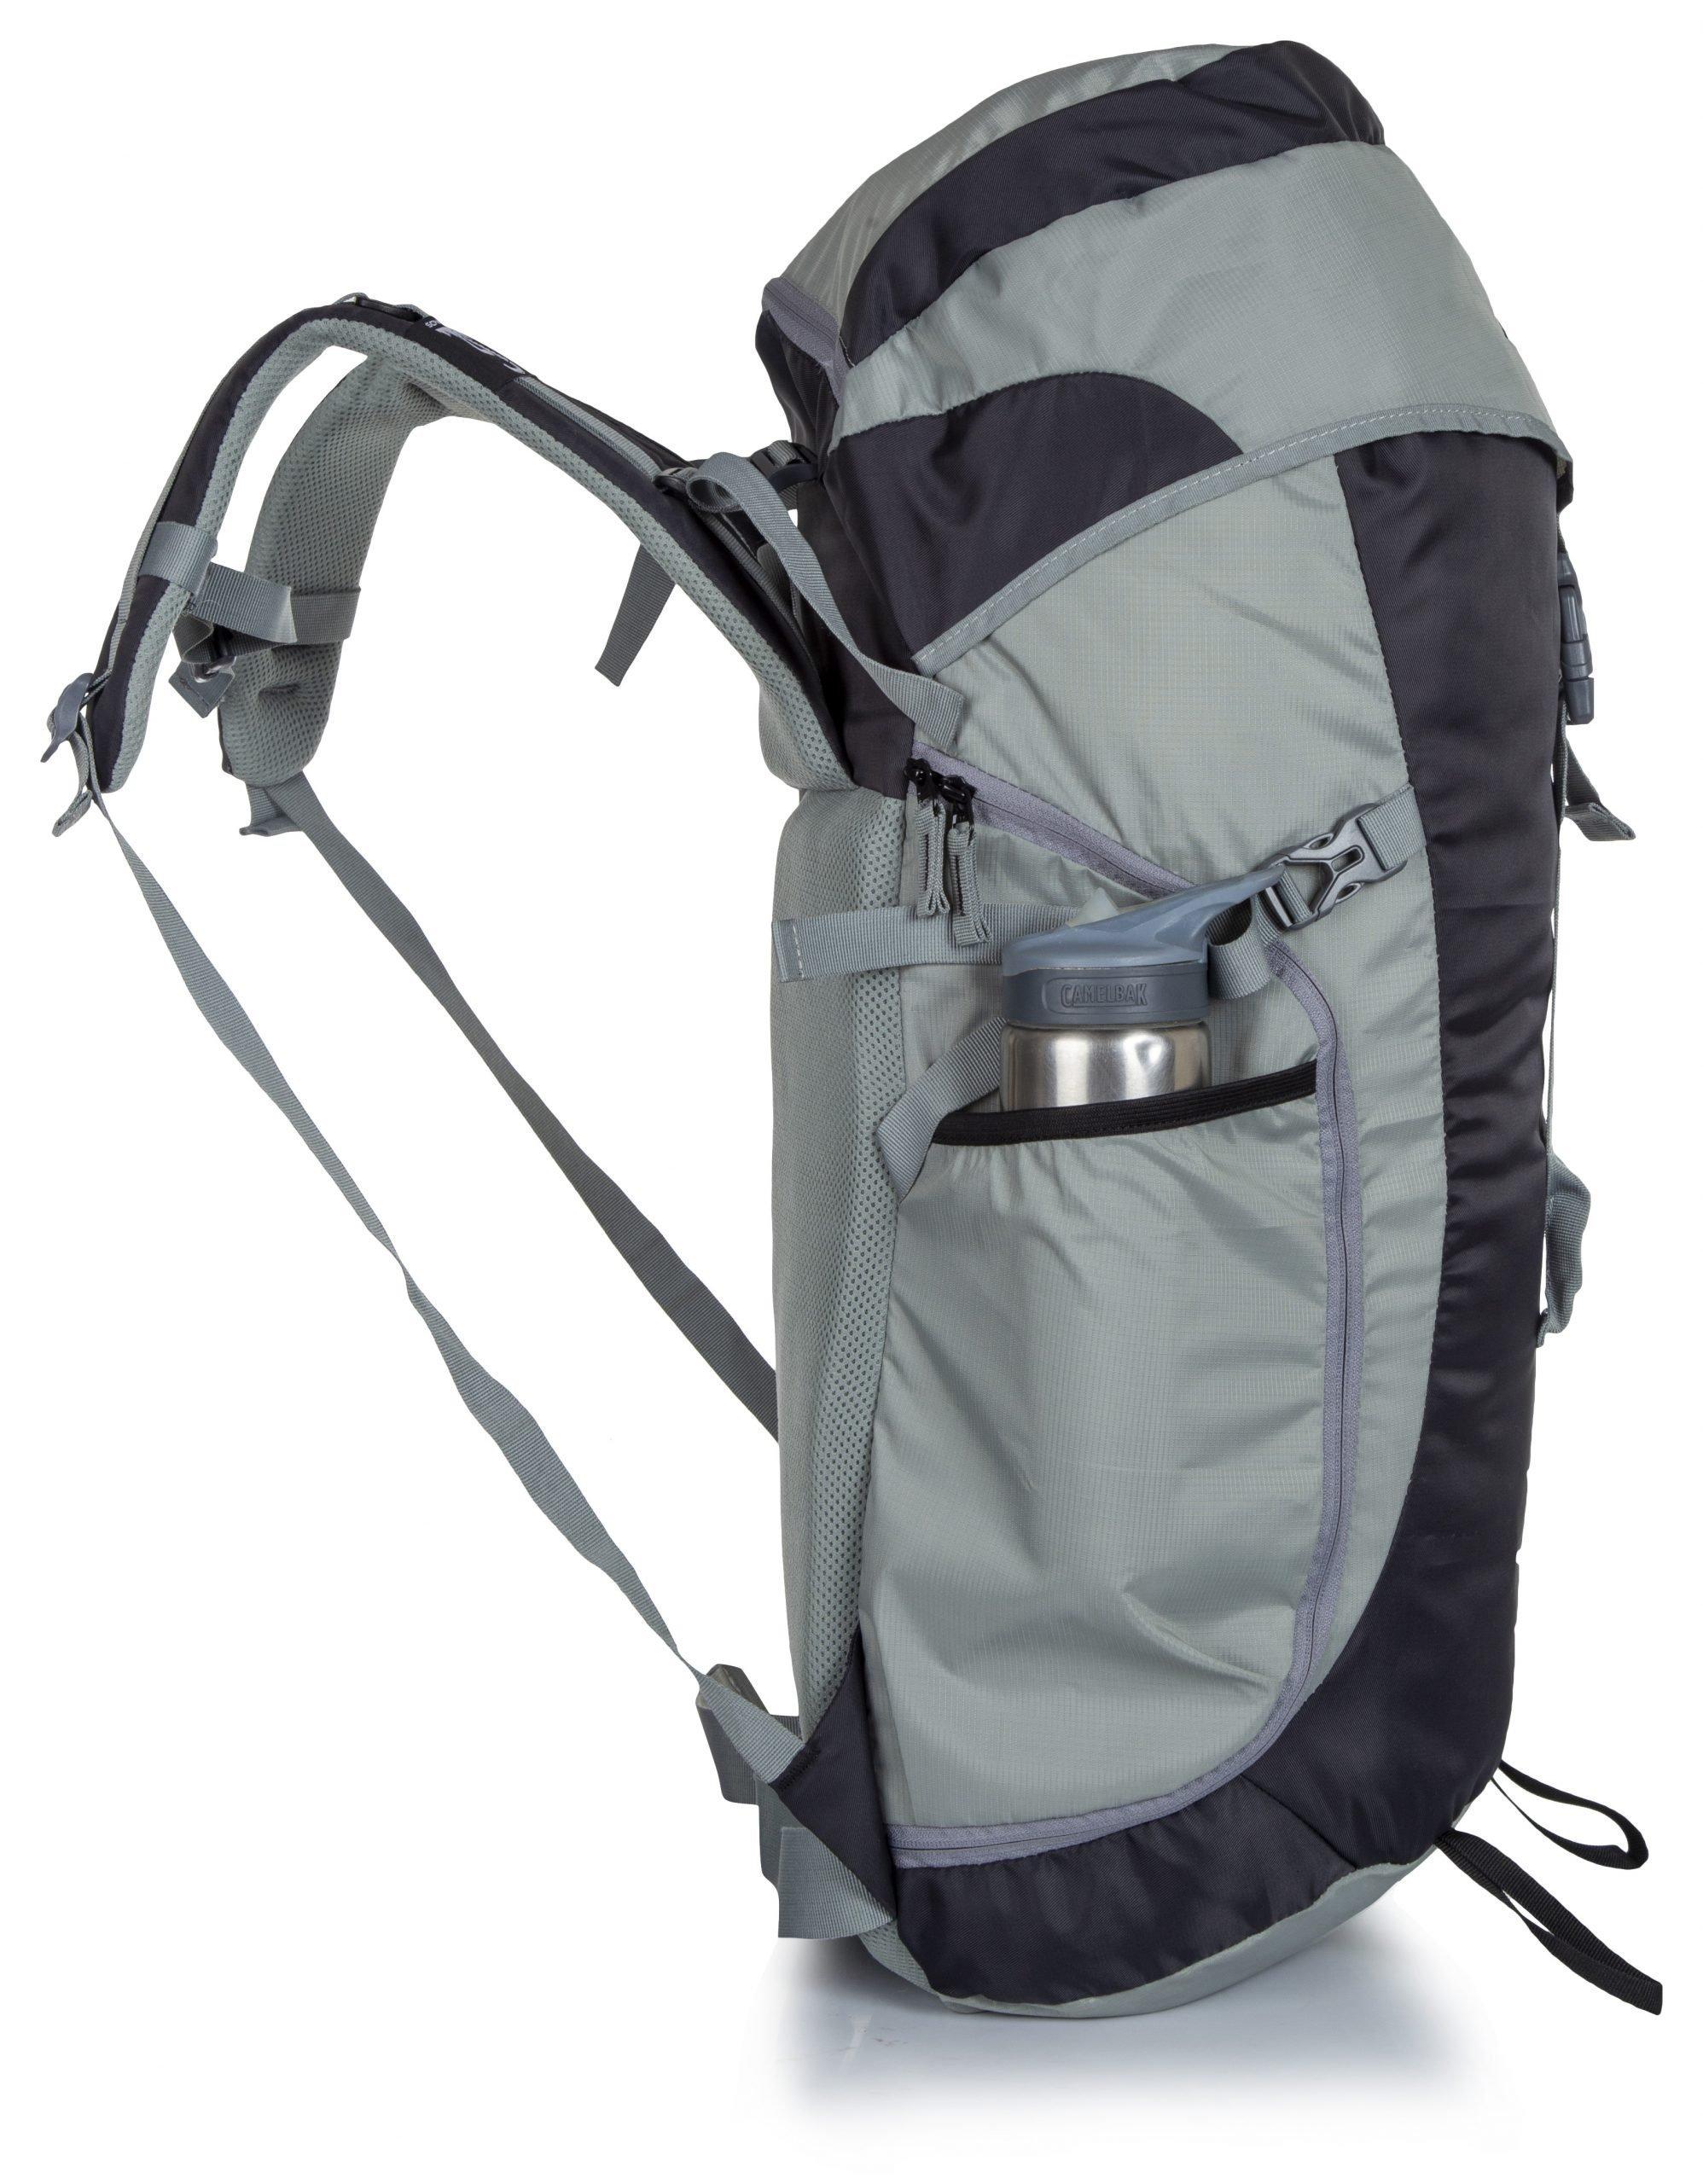 Overnight Trips Bag